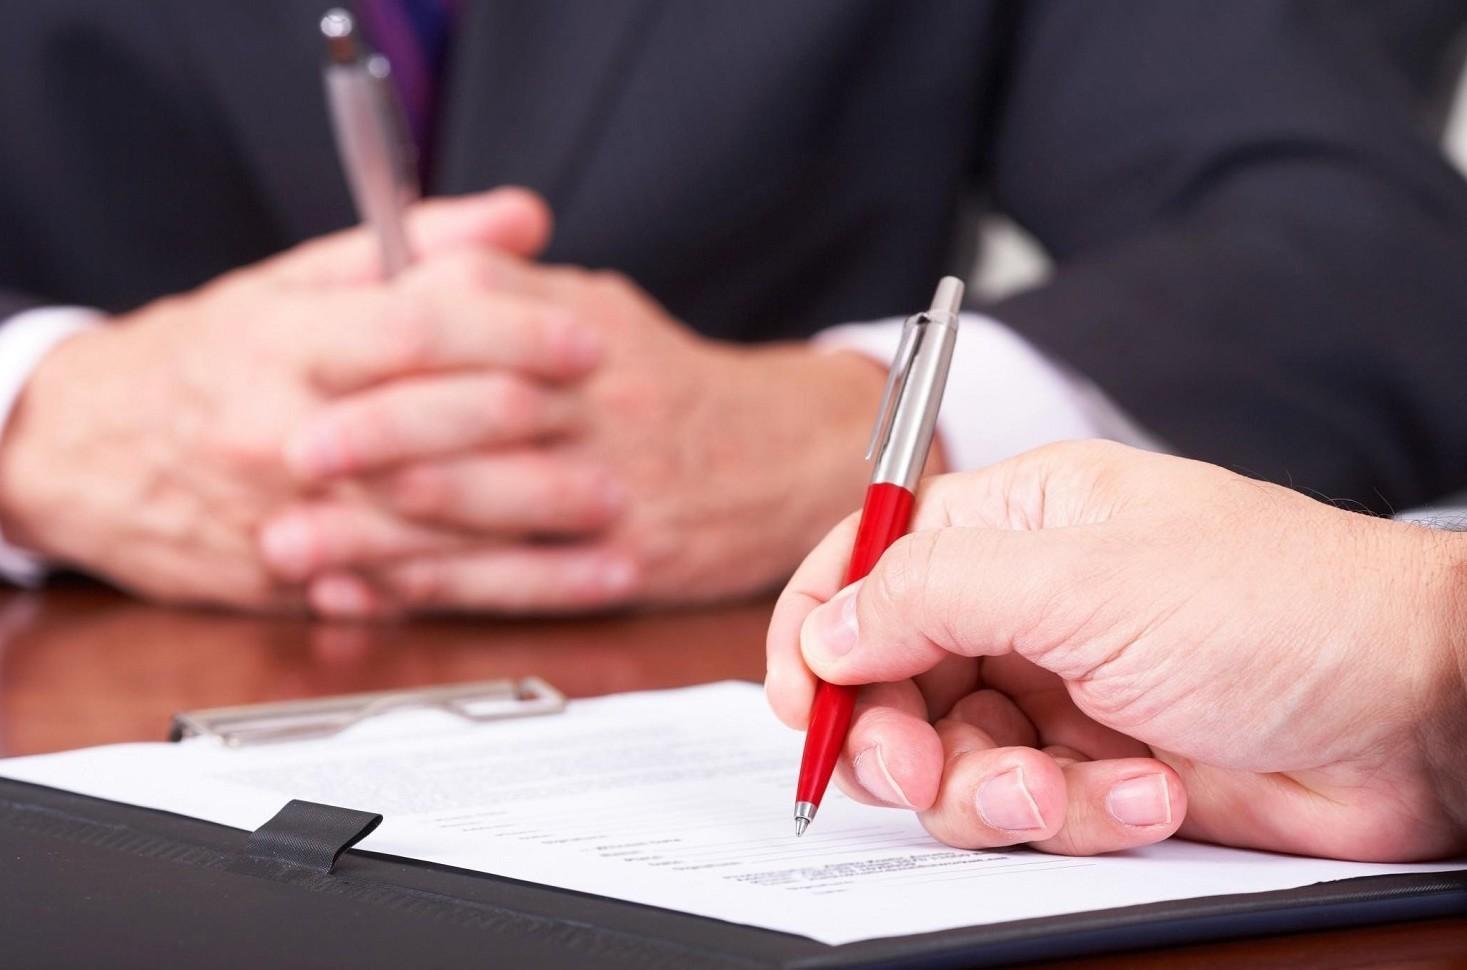 Conto corrente cointestato, firma congiunta o disgiunta. Regole 2019-2020